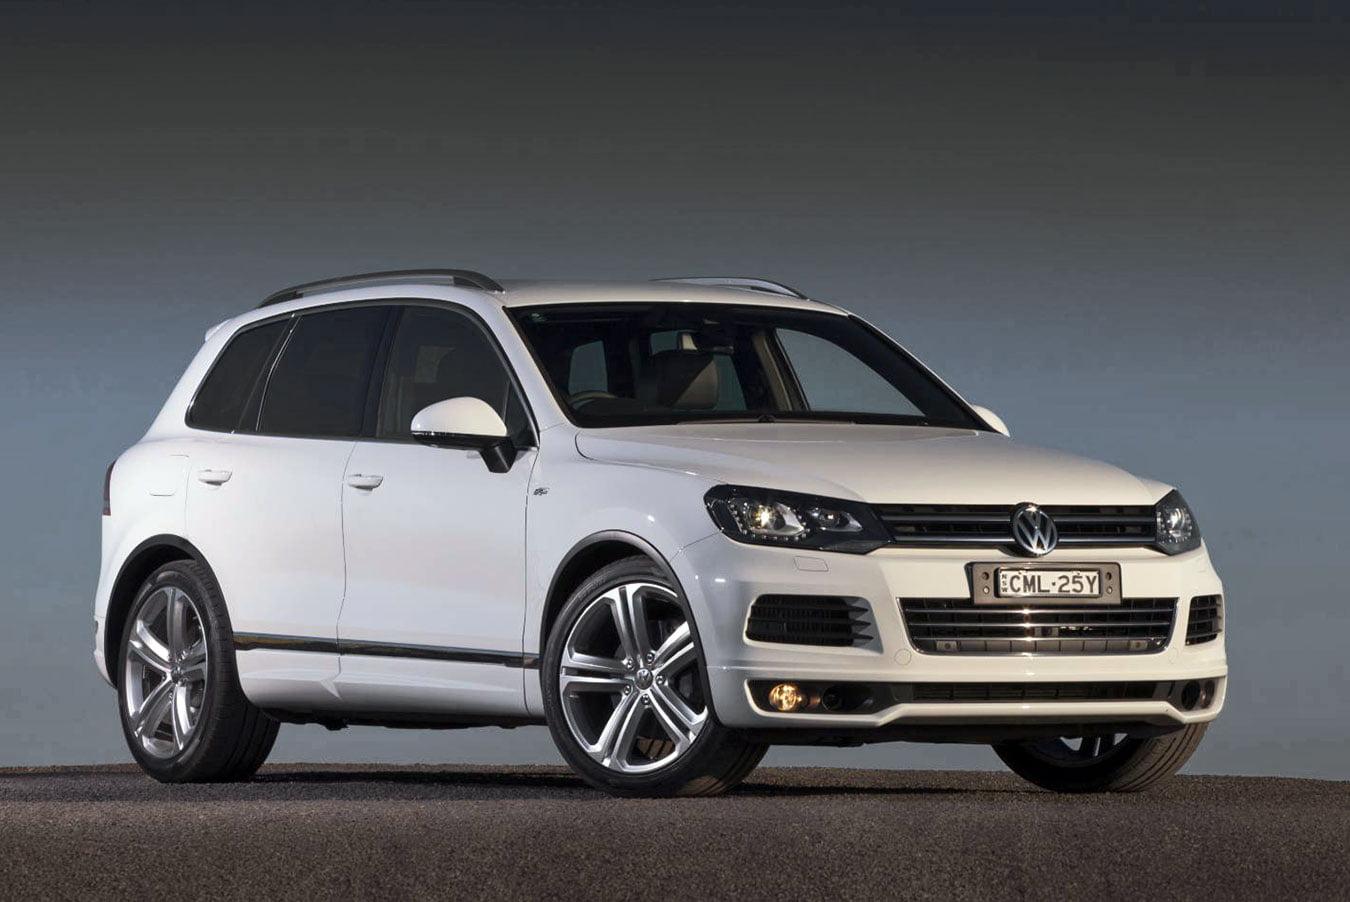 Volkswagen Touareg Mk2 (2011-2014)